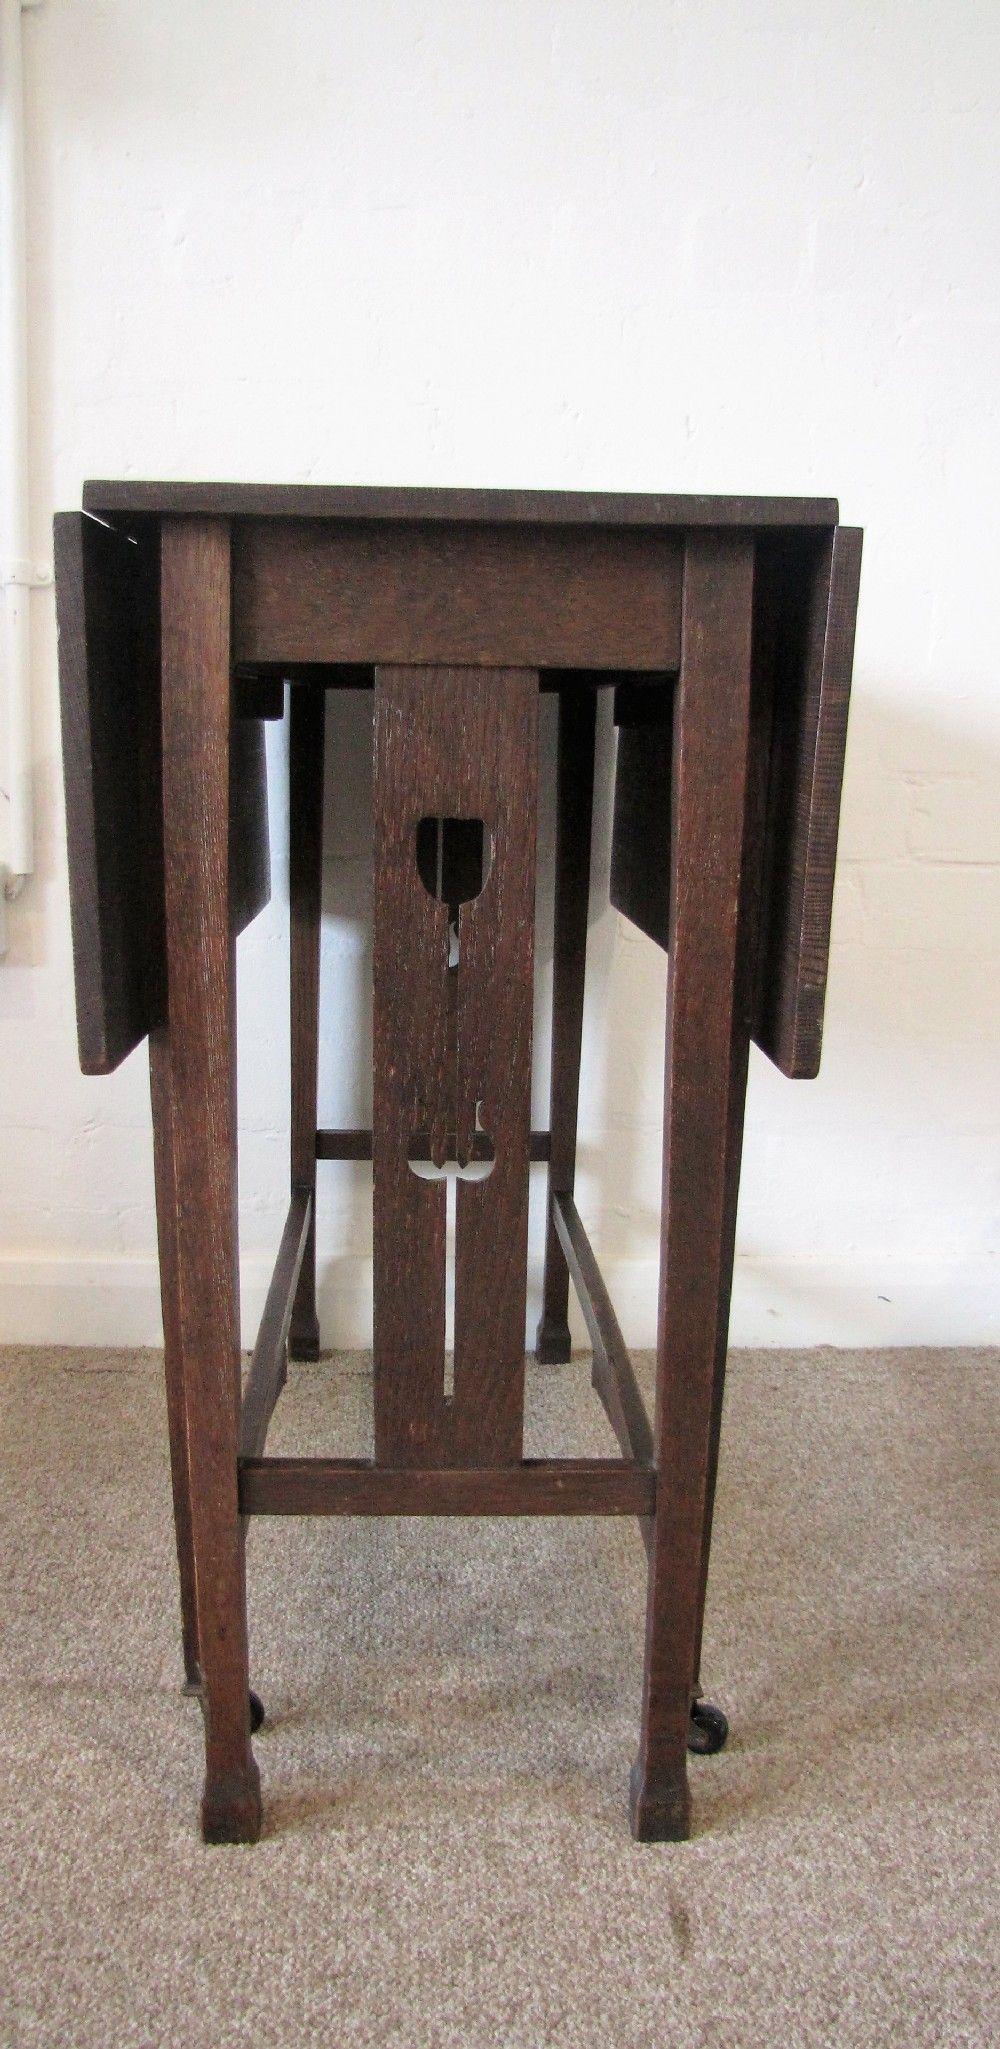 37+ Arts and crafts furniture uk ideas